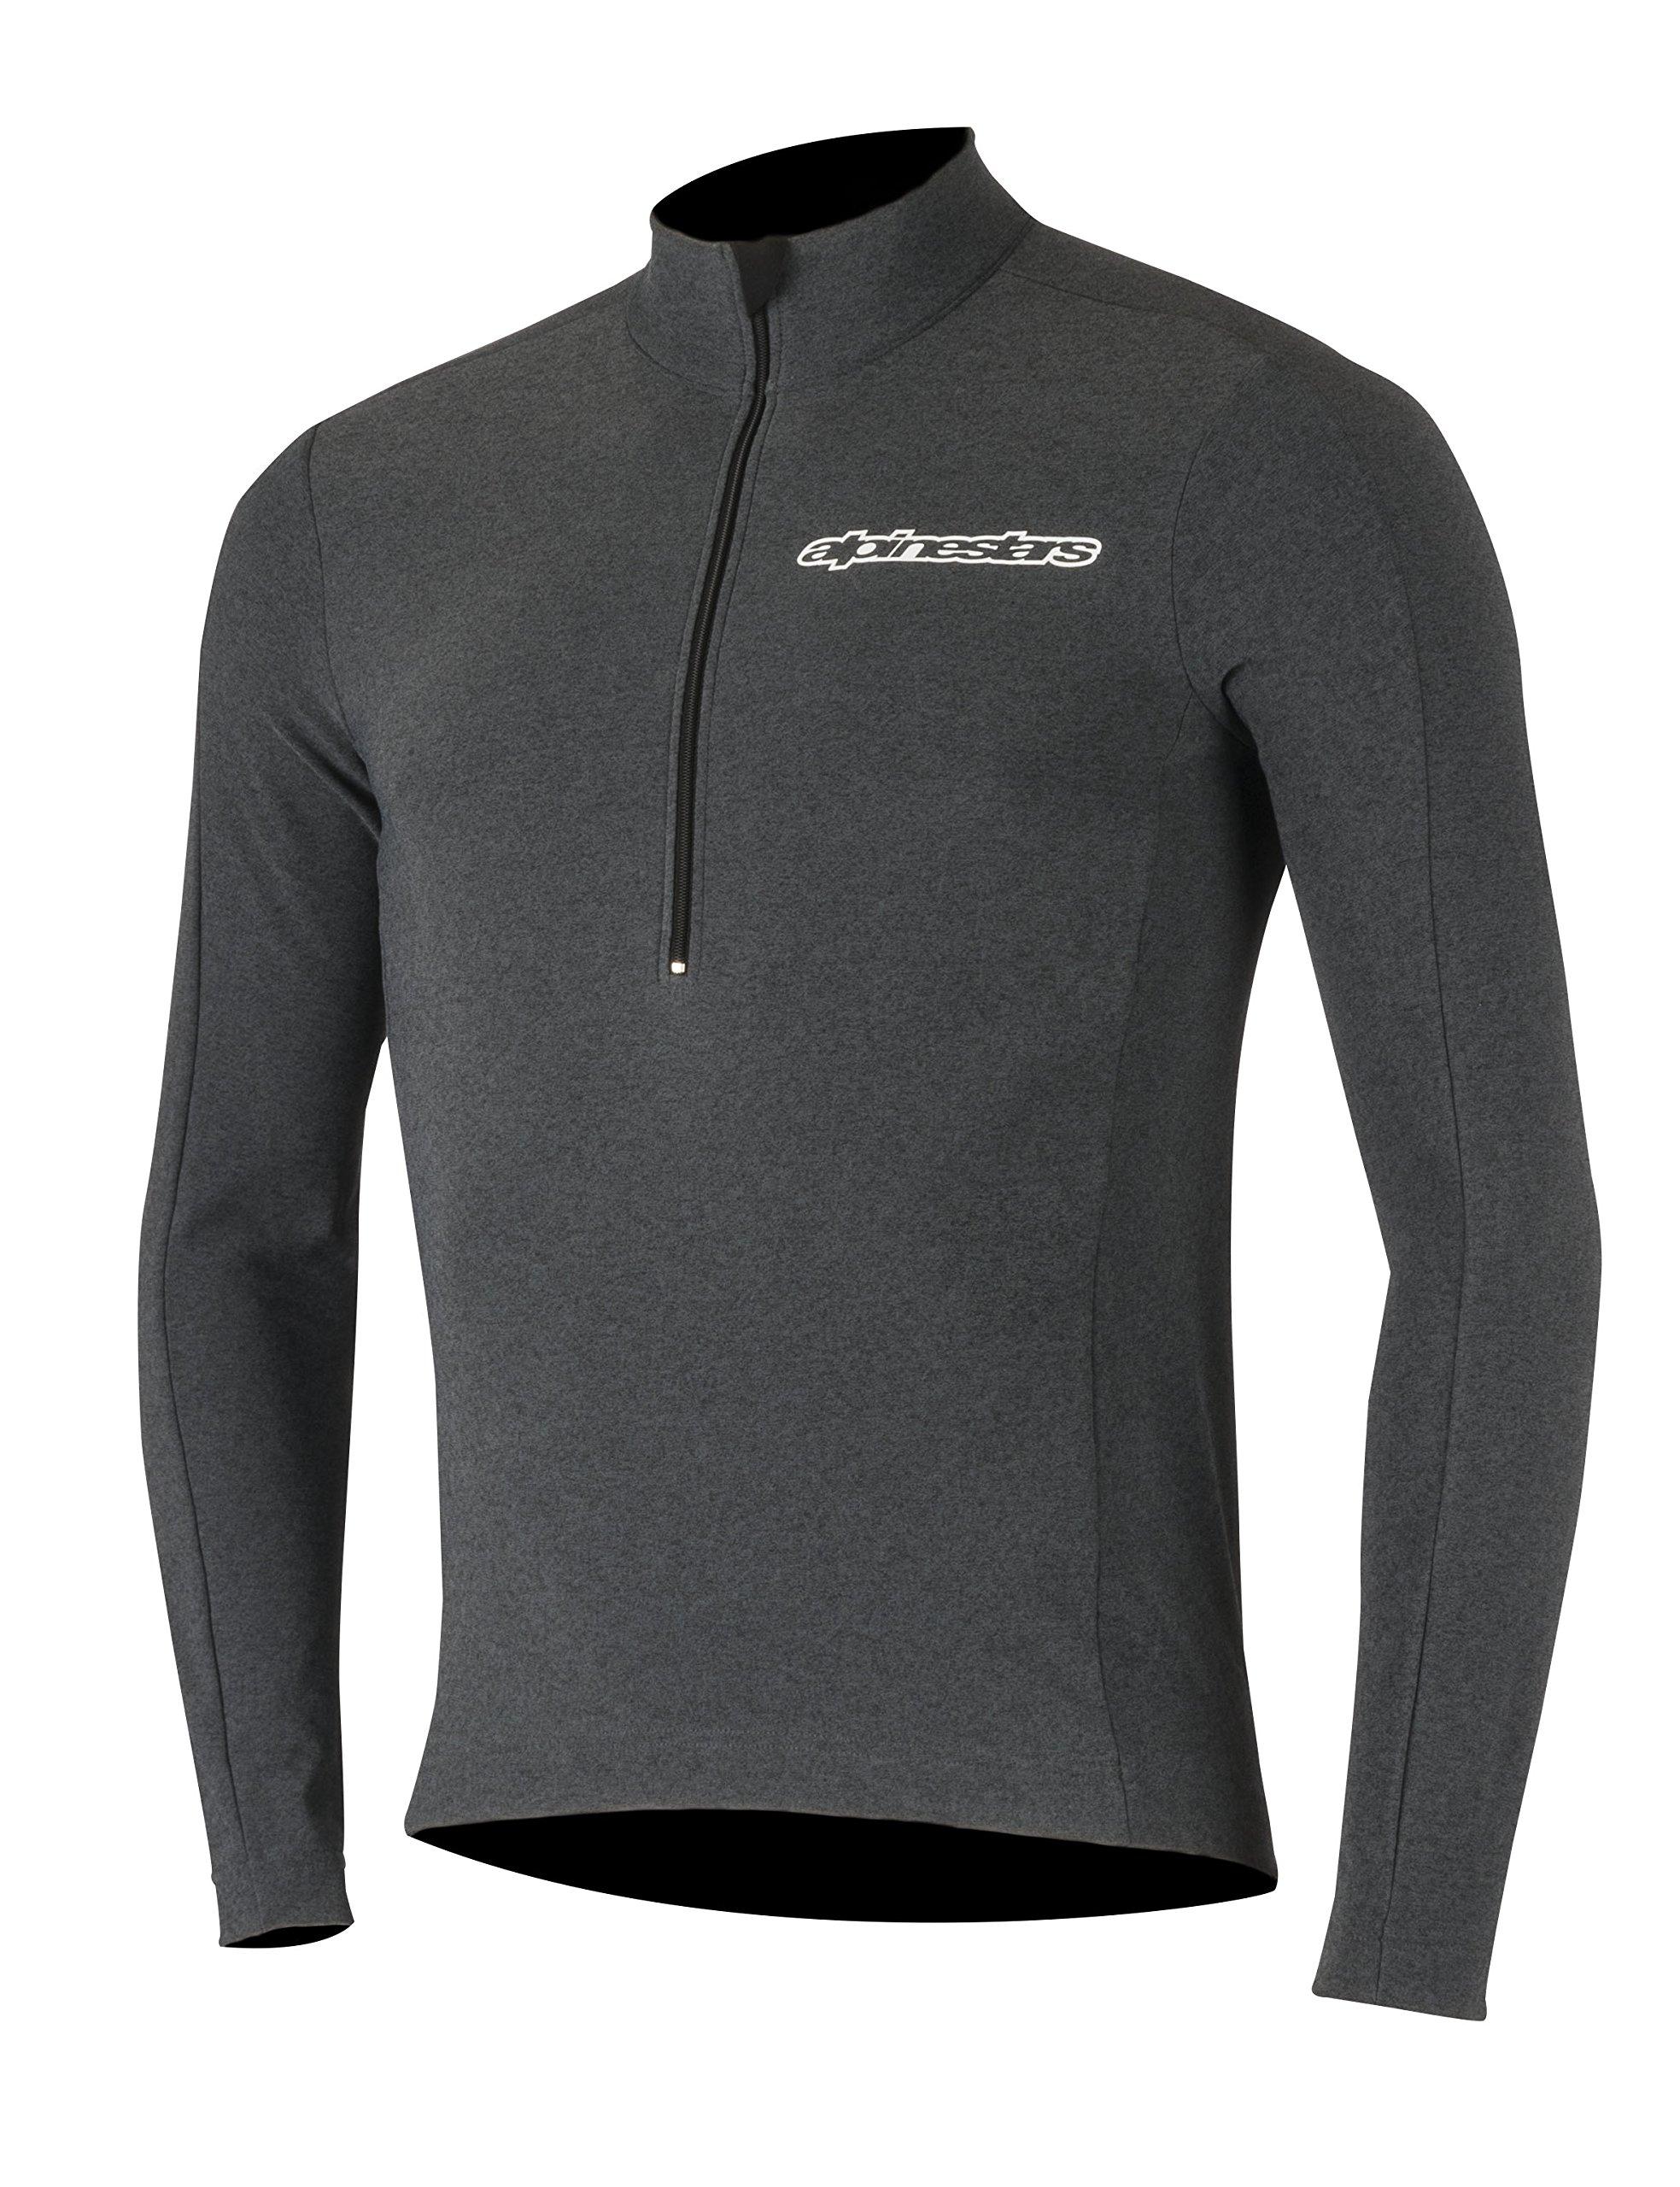 Alpinestars Men's Booter Warm Jersey, Black/White, Large